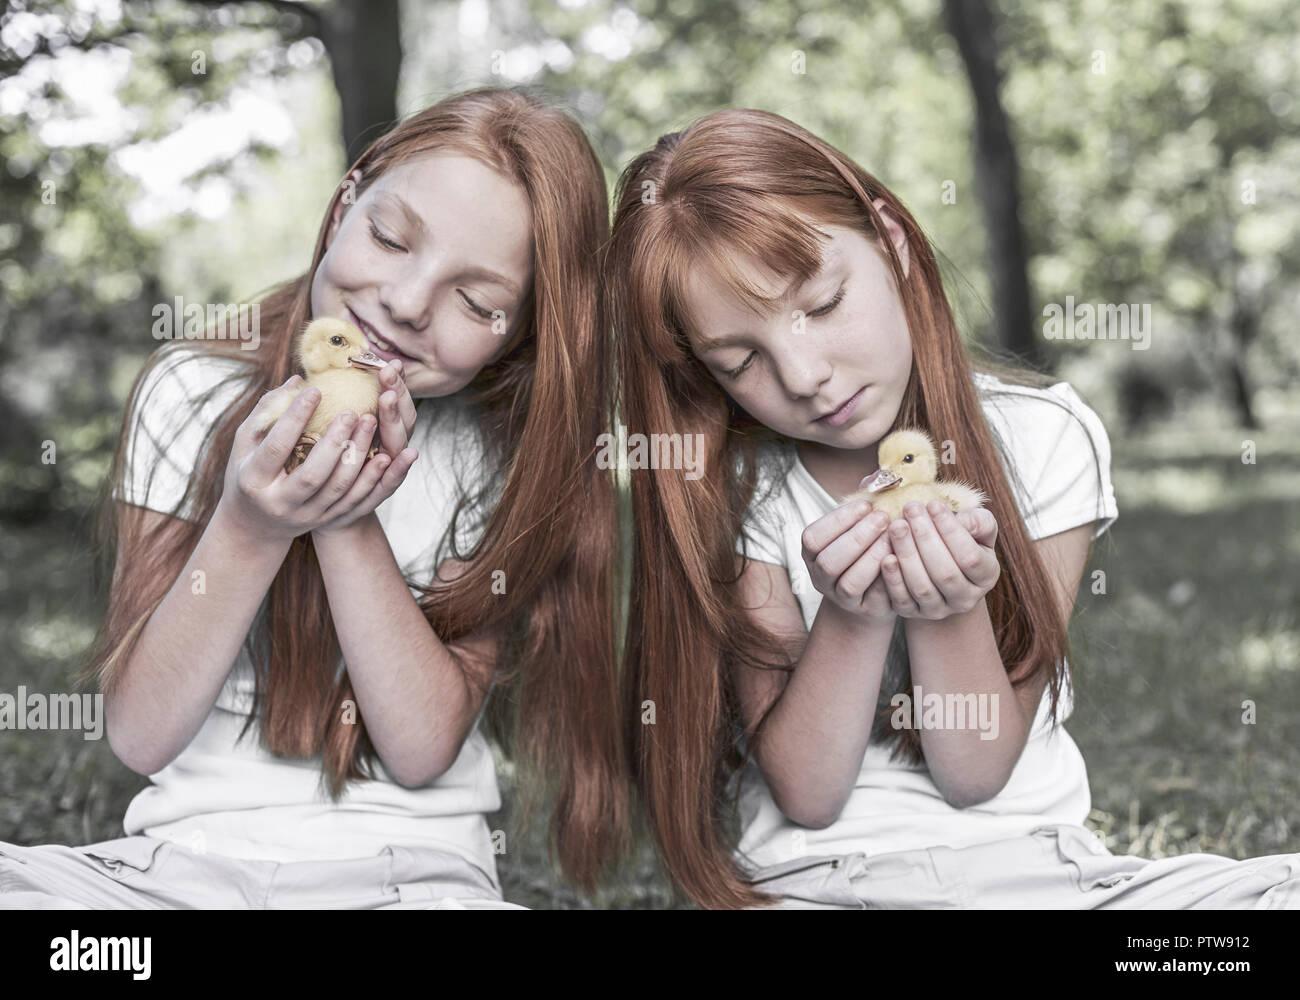 Rothaarige Zwillingsmaedchen mit zwei Entenkueken (model-released) - Stock Image